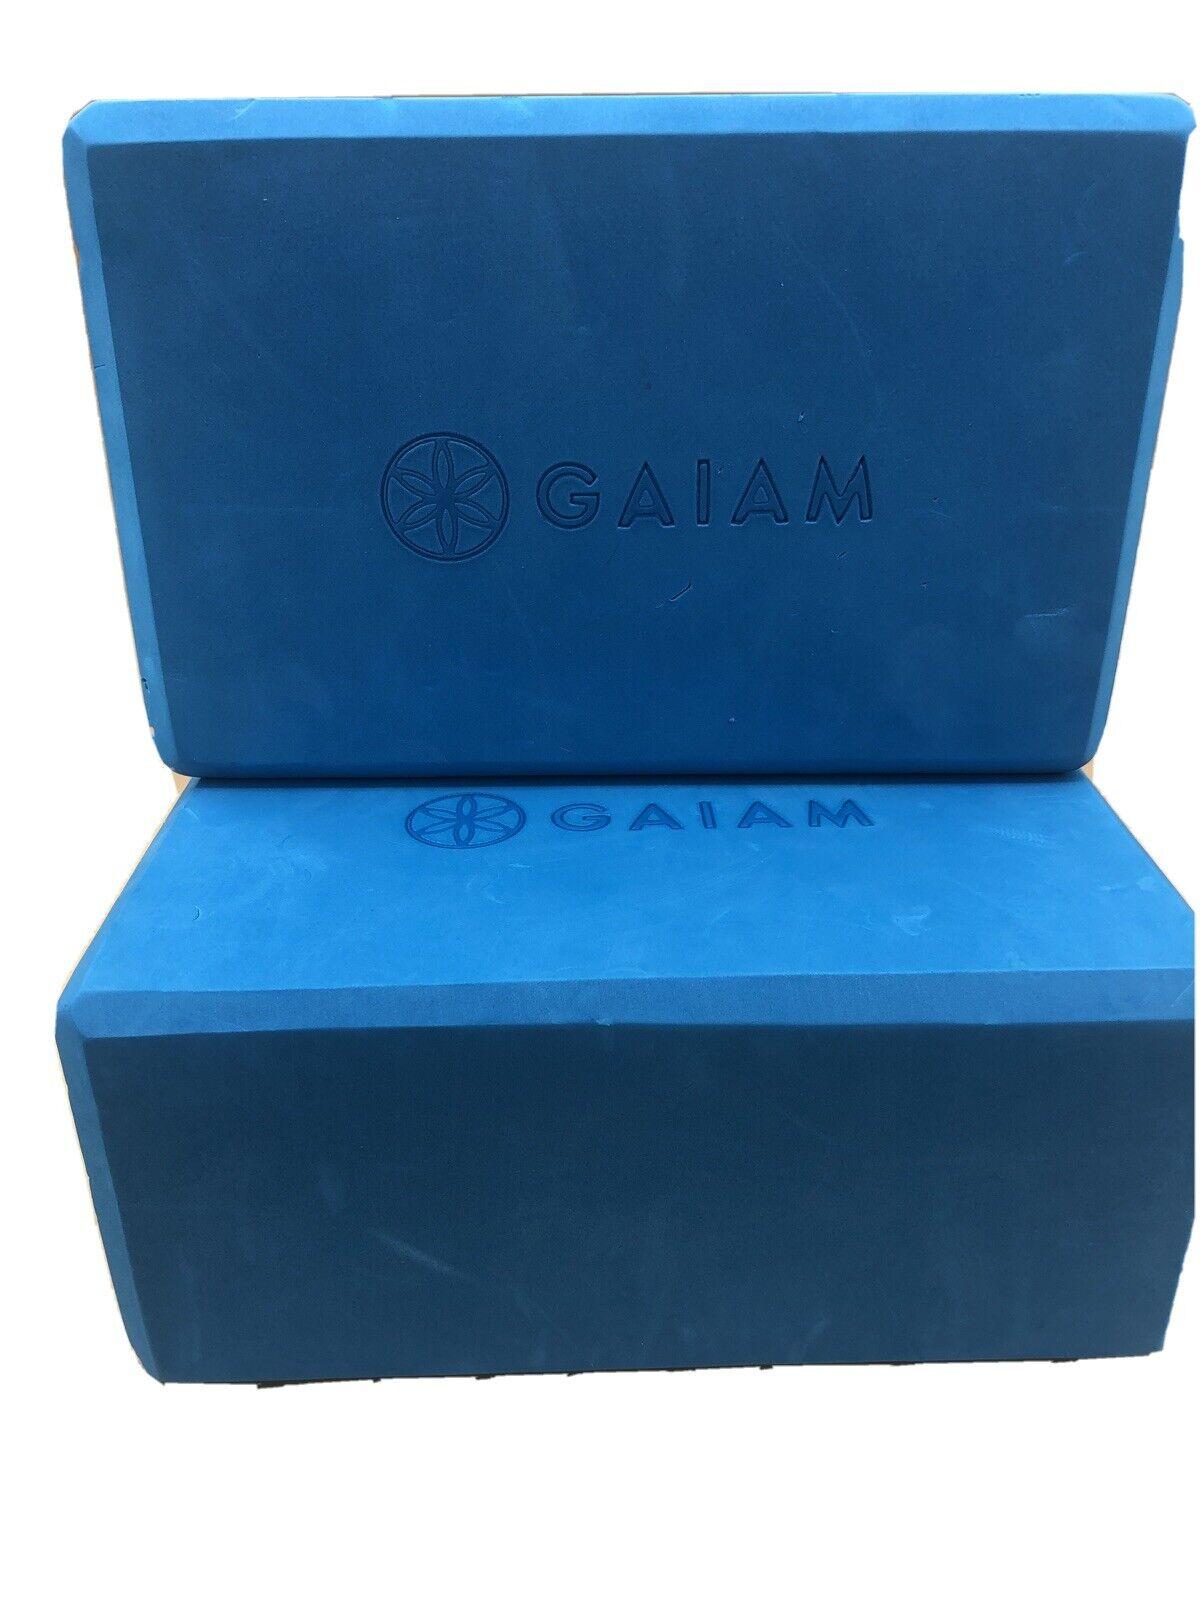 2 Gaiam Foam Yoga Block appox. 9″ x 6″ x 4″  Teal Blue Light Use